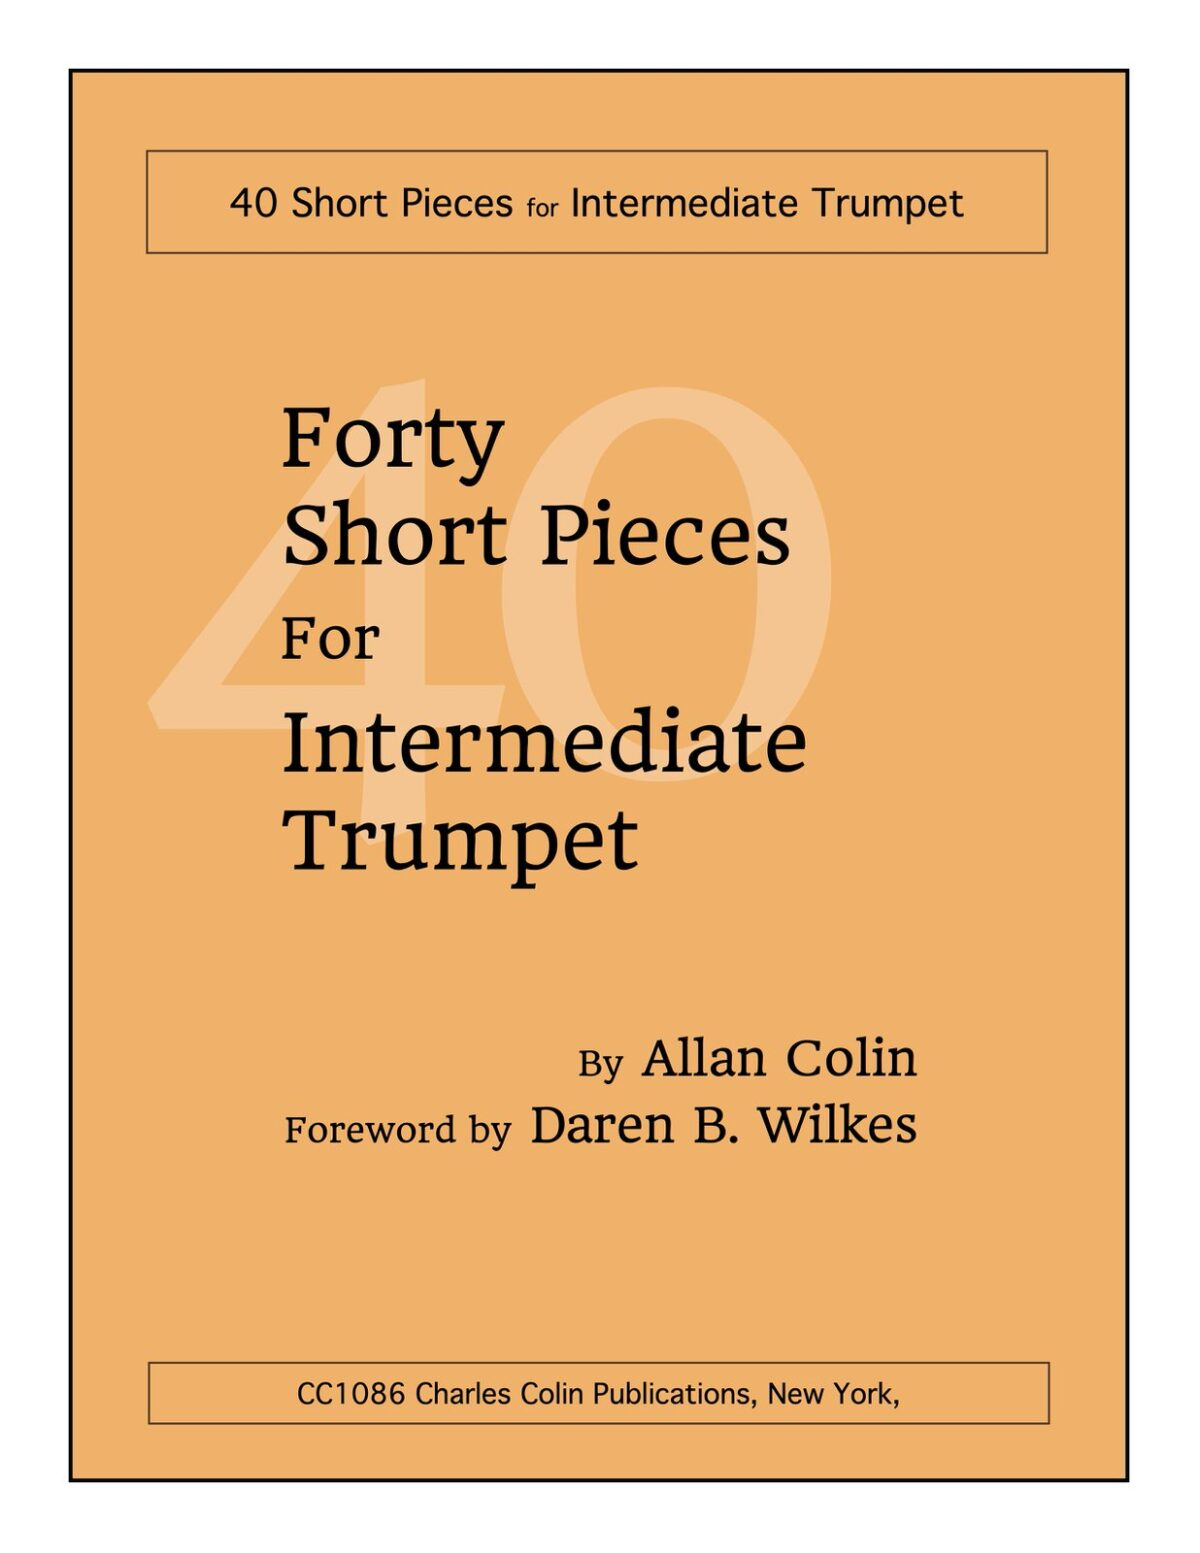 Colin, 40 Short Pieces for Intermediate Trumpet-p01